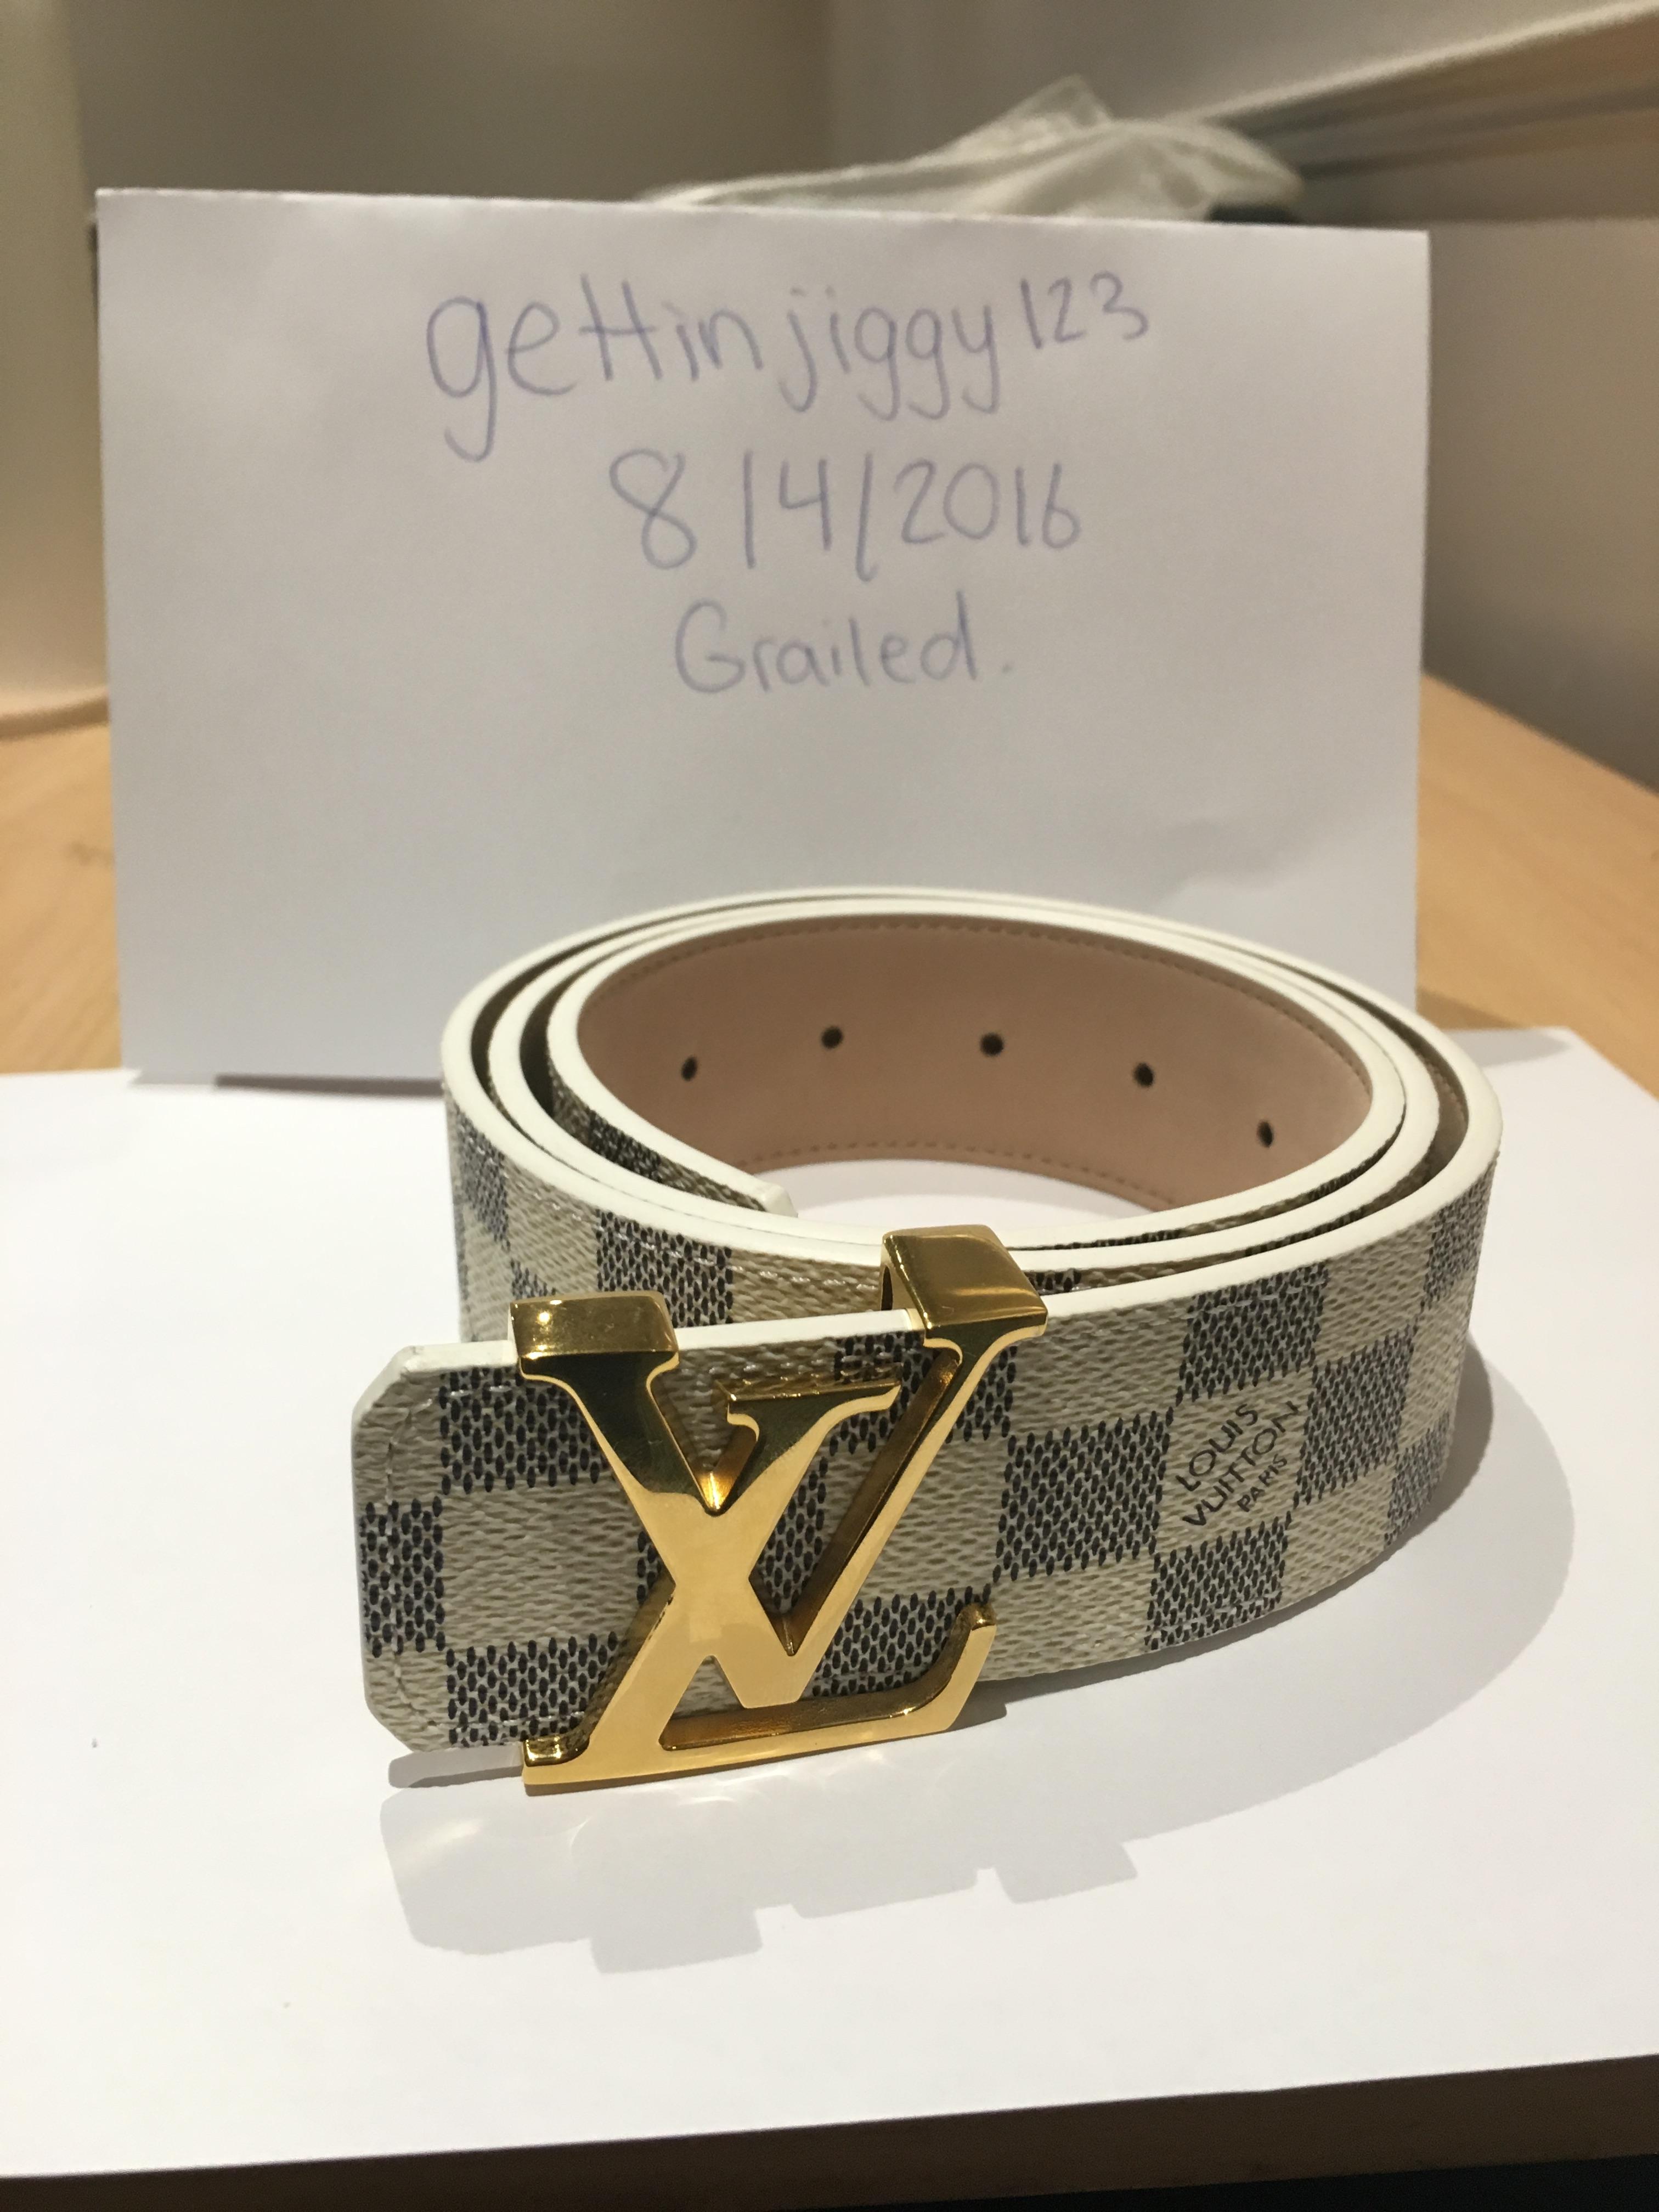 1f4db2beee6d6 Louis Vuitton Damier Azur Belt Size 32 - Belts for Sale - Grailed